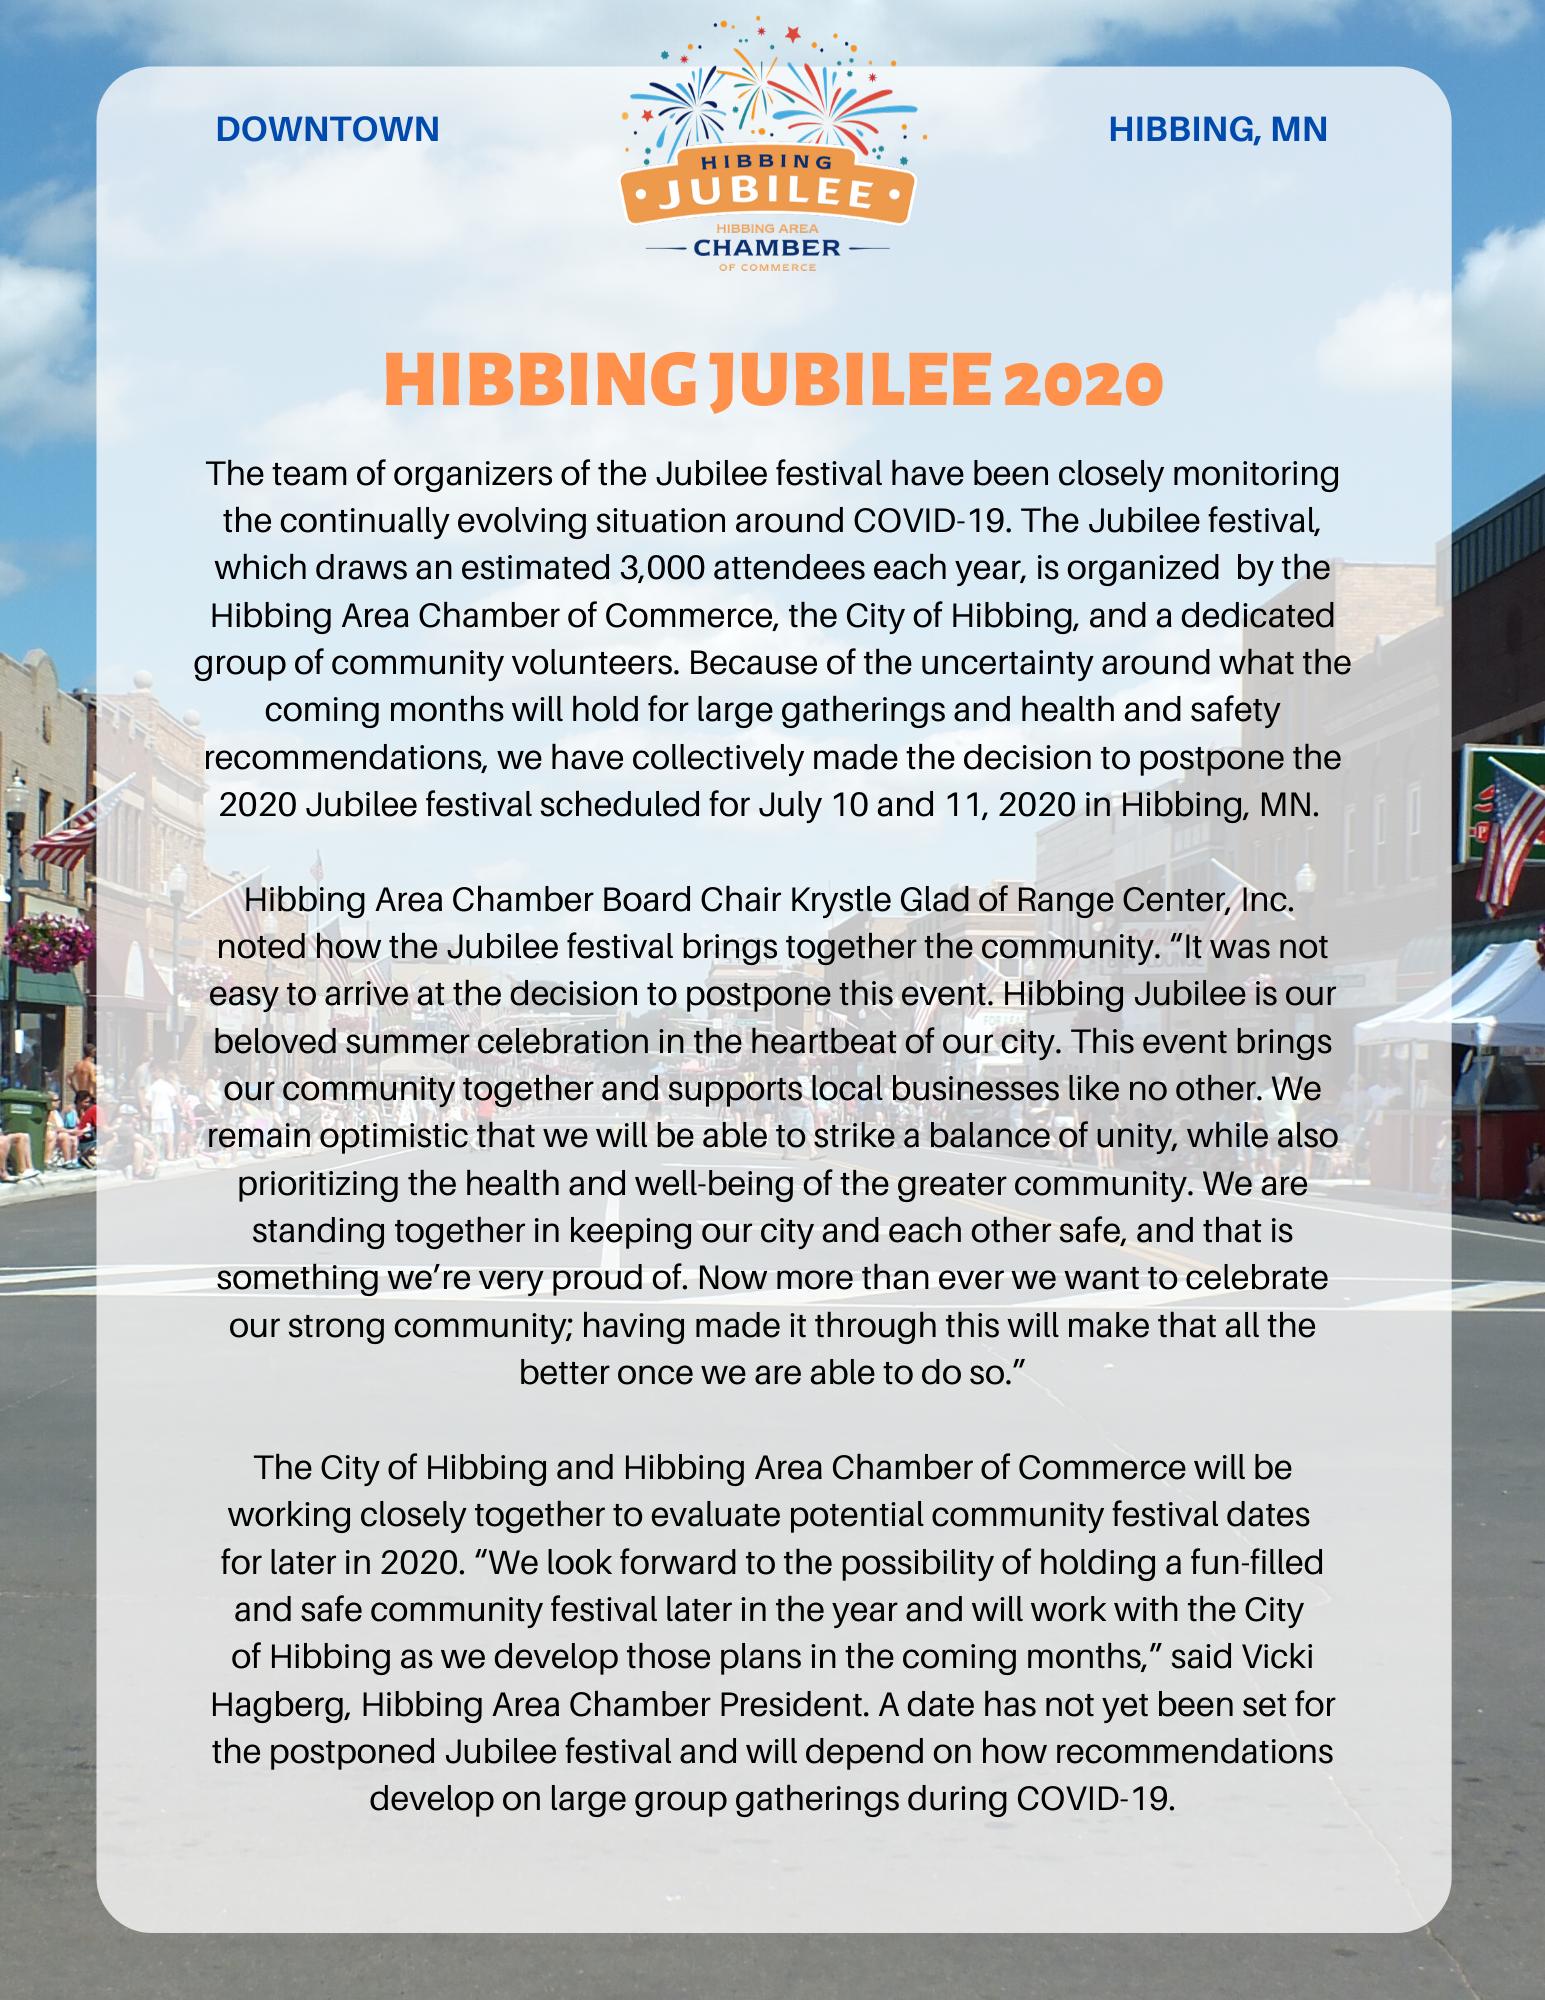 Jubilee 2020 Postpone Announcement